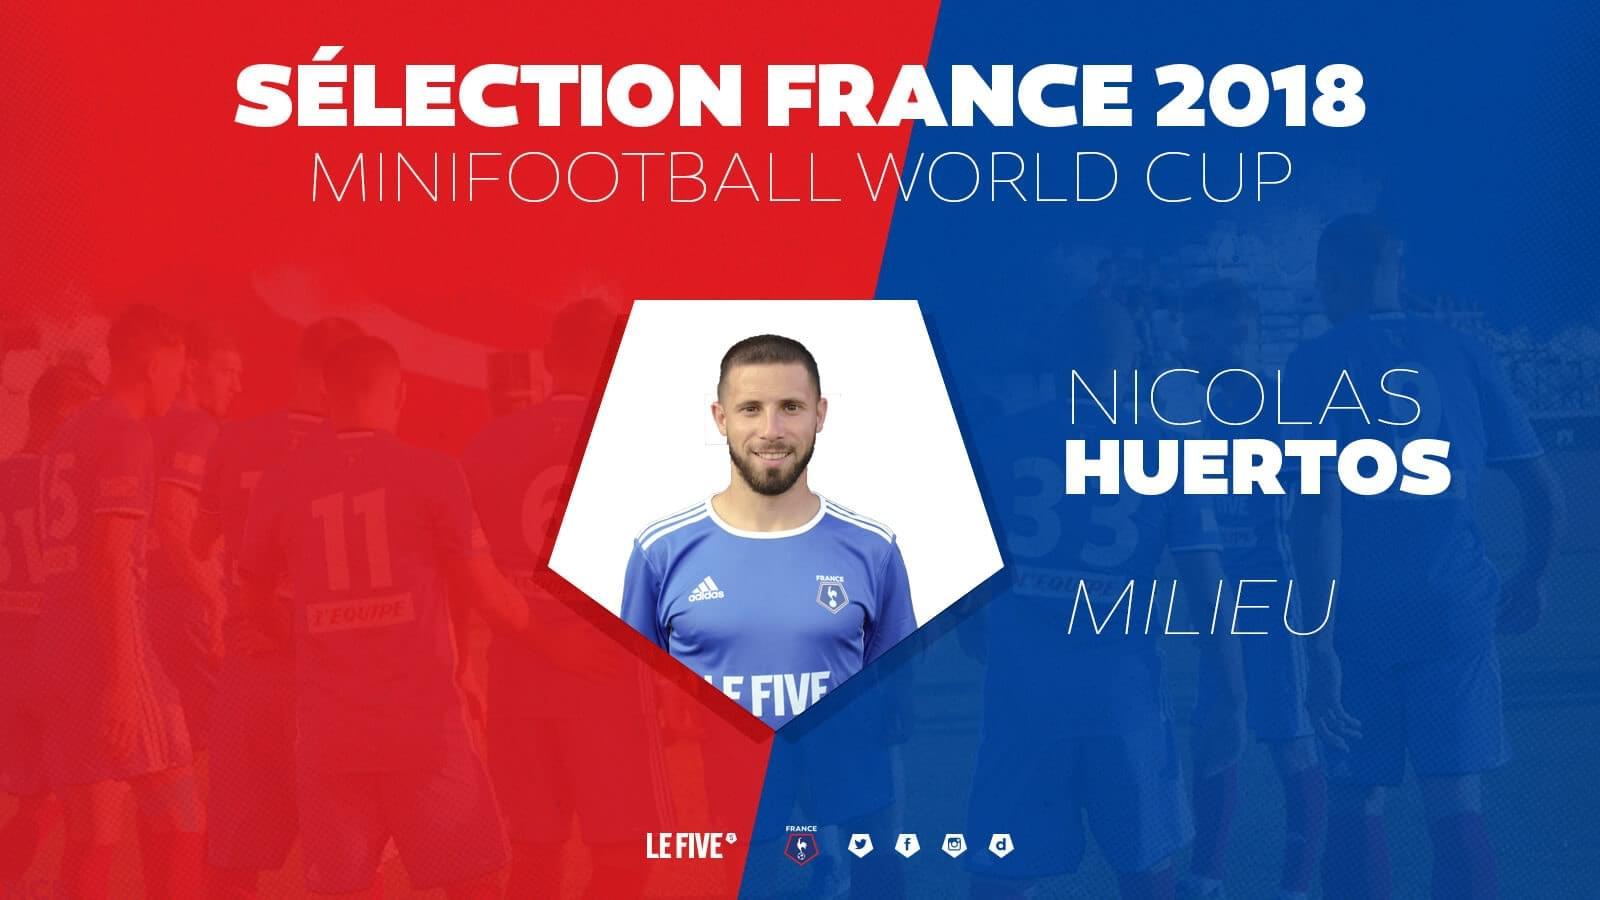 Nicolas Huertos